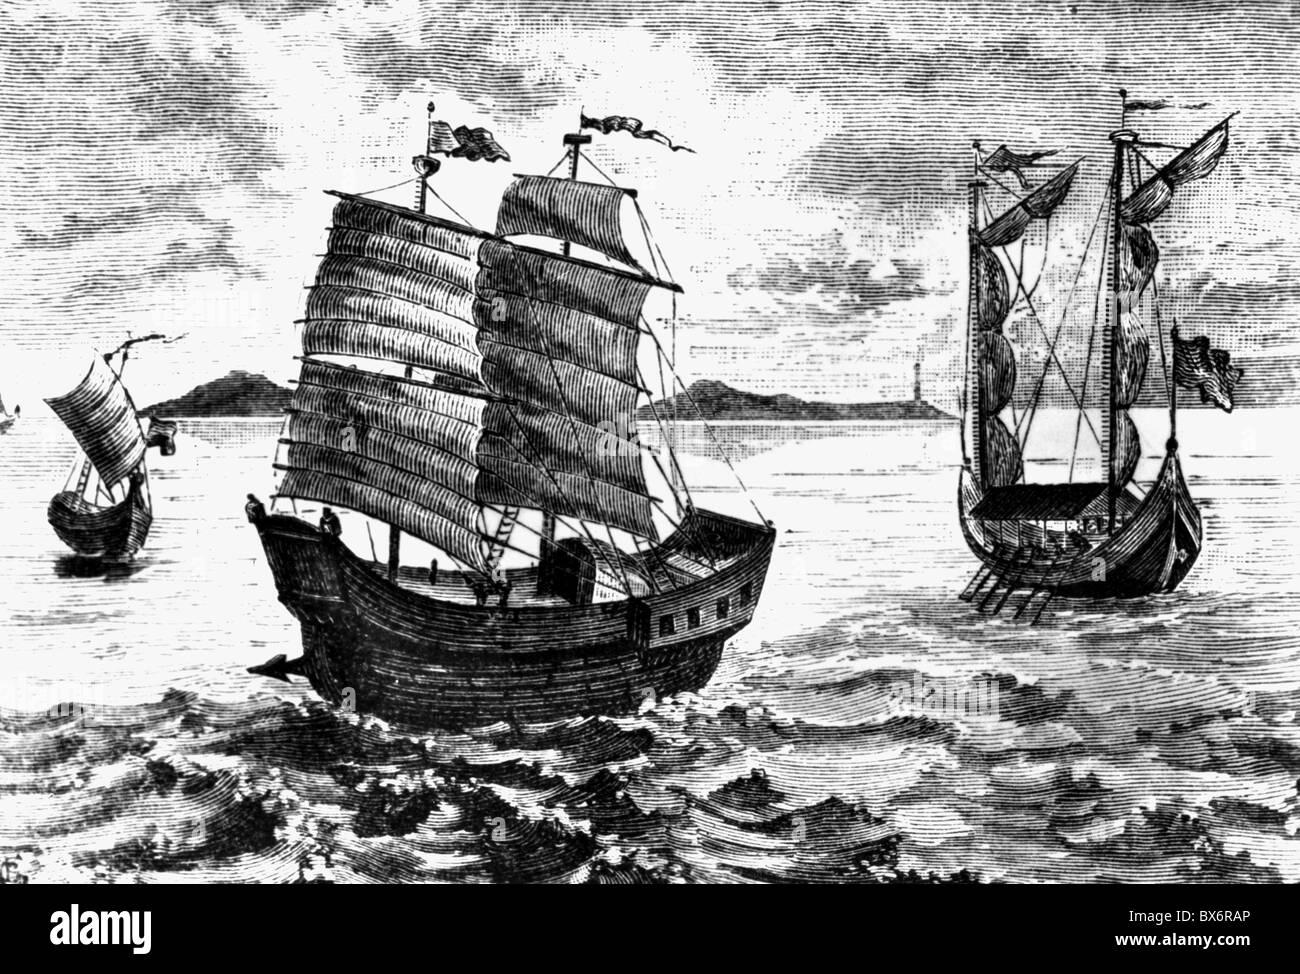 Magellan, Ferdinand (Magalhaes, Fernao de), 1480 - 27.4.1521, Portuguese navigator and explorer, his ships, Additional - Stock Image